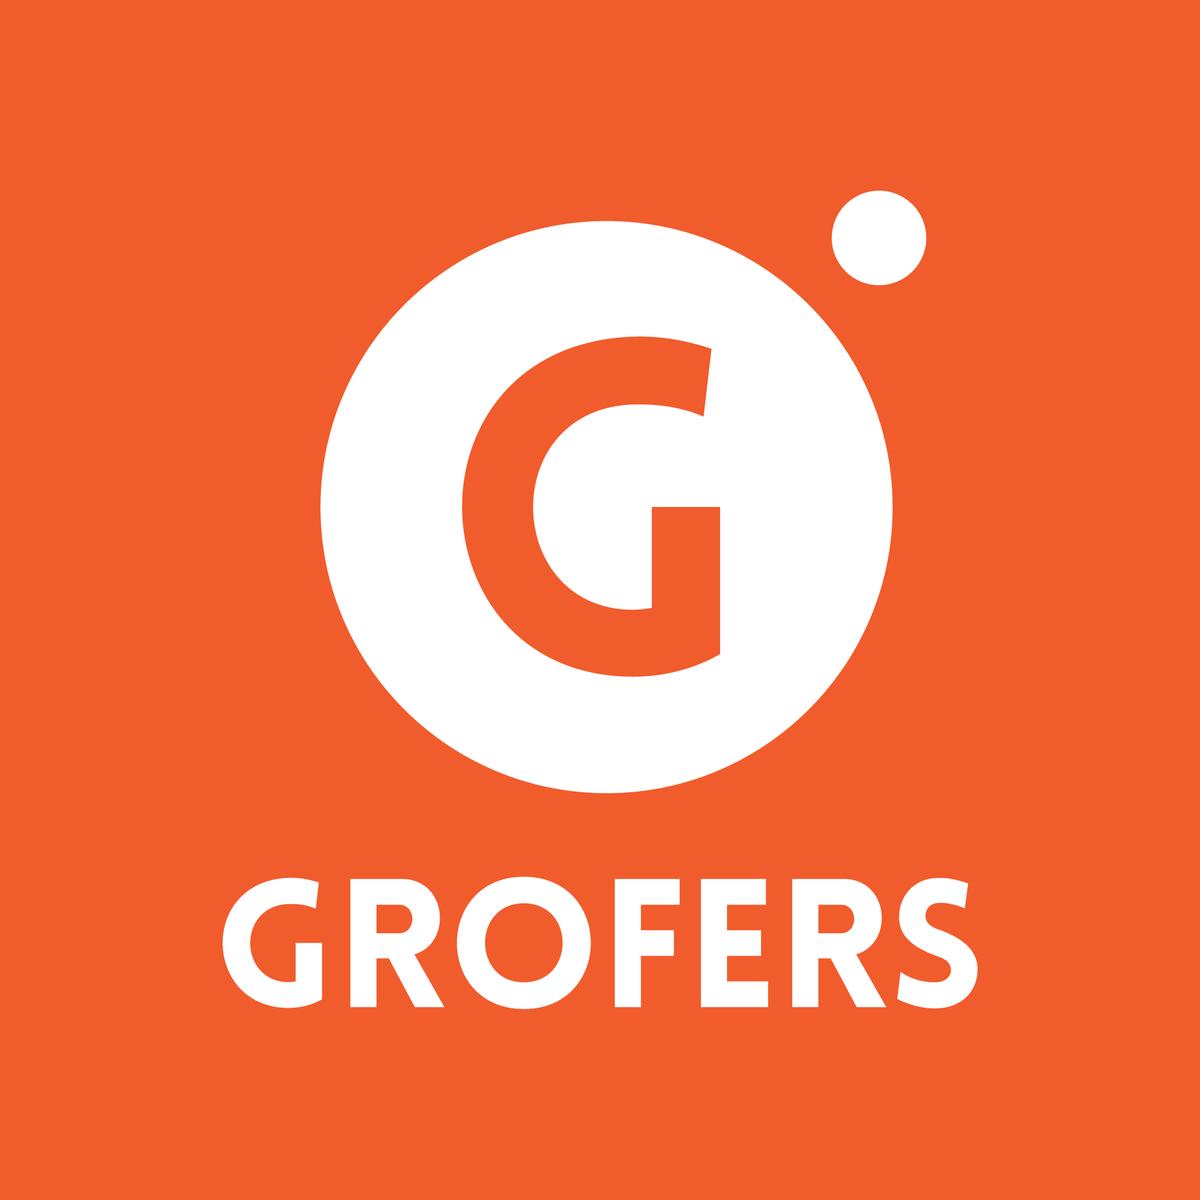 Grofers - Wikipedia